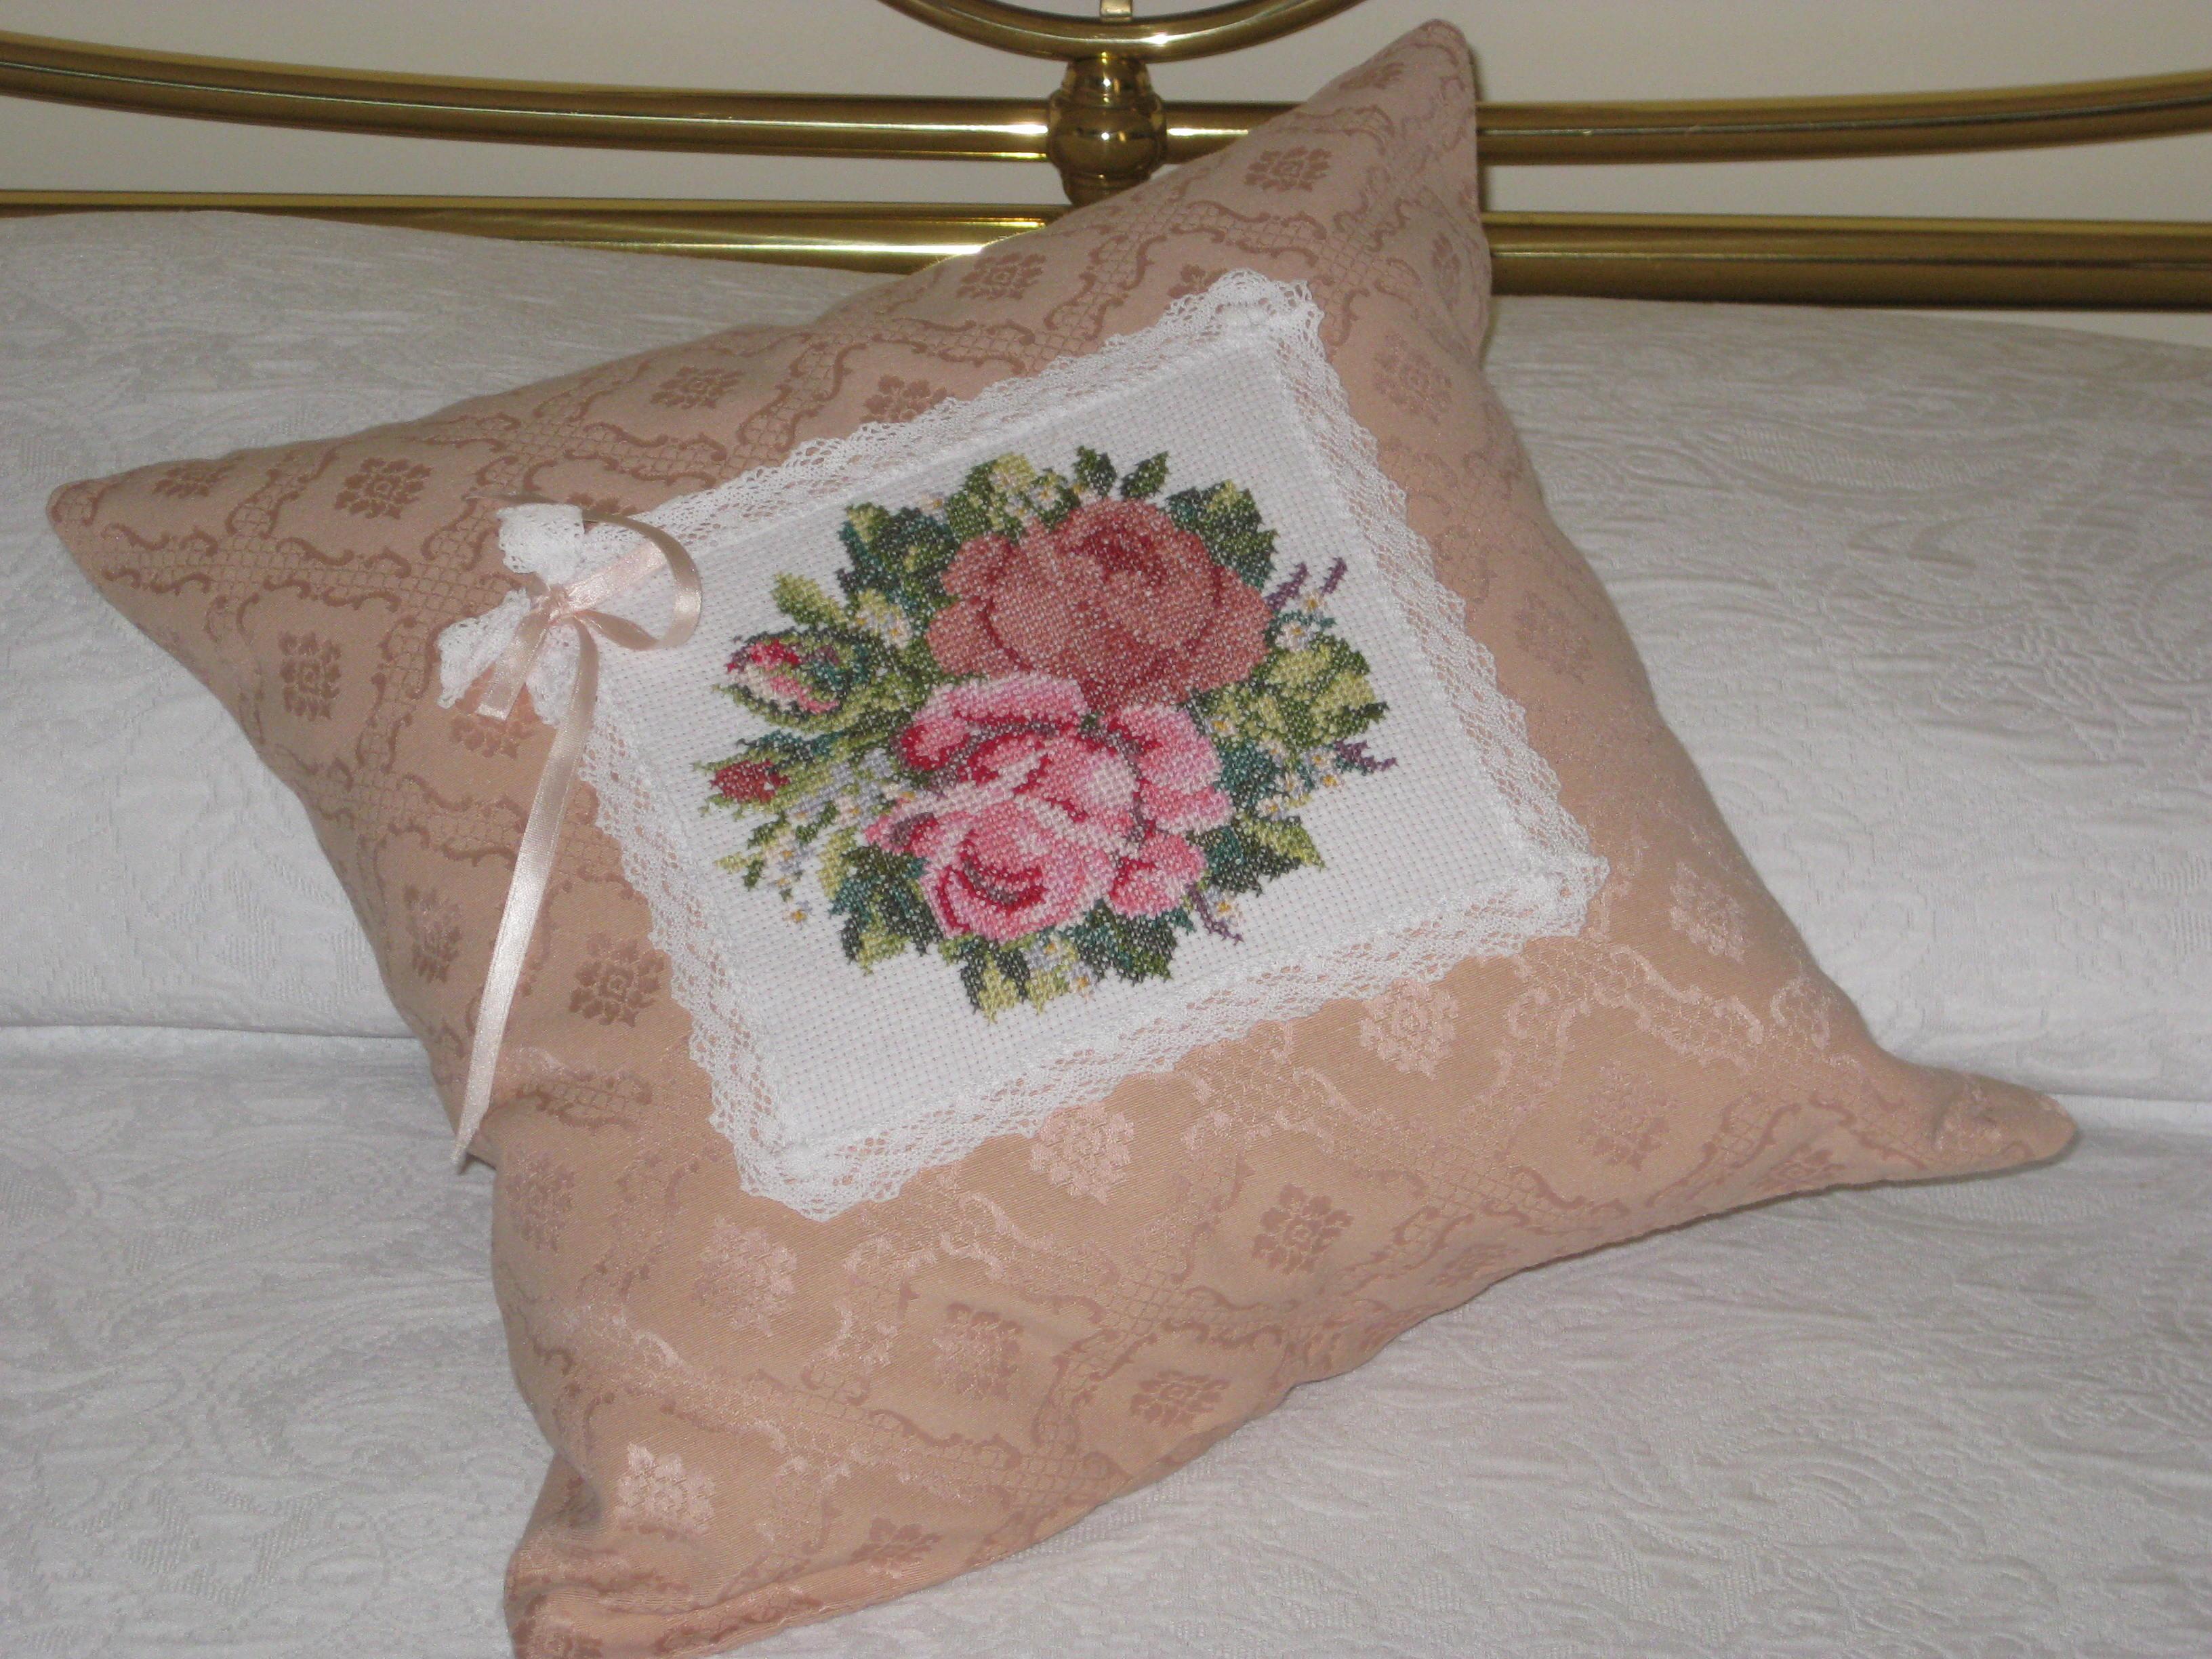 Cuscini Con Rose.Cuscino Con Rose Gift